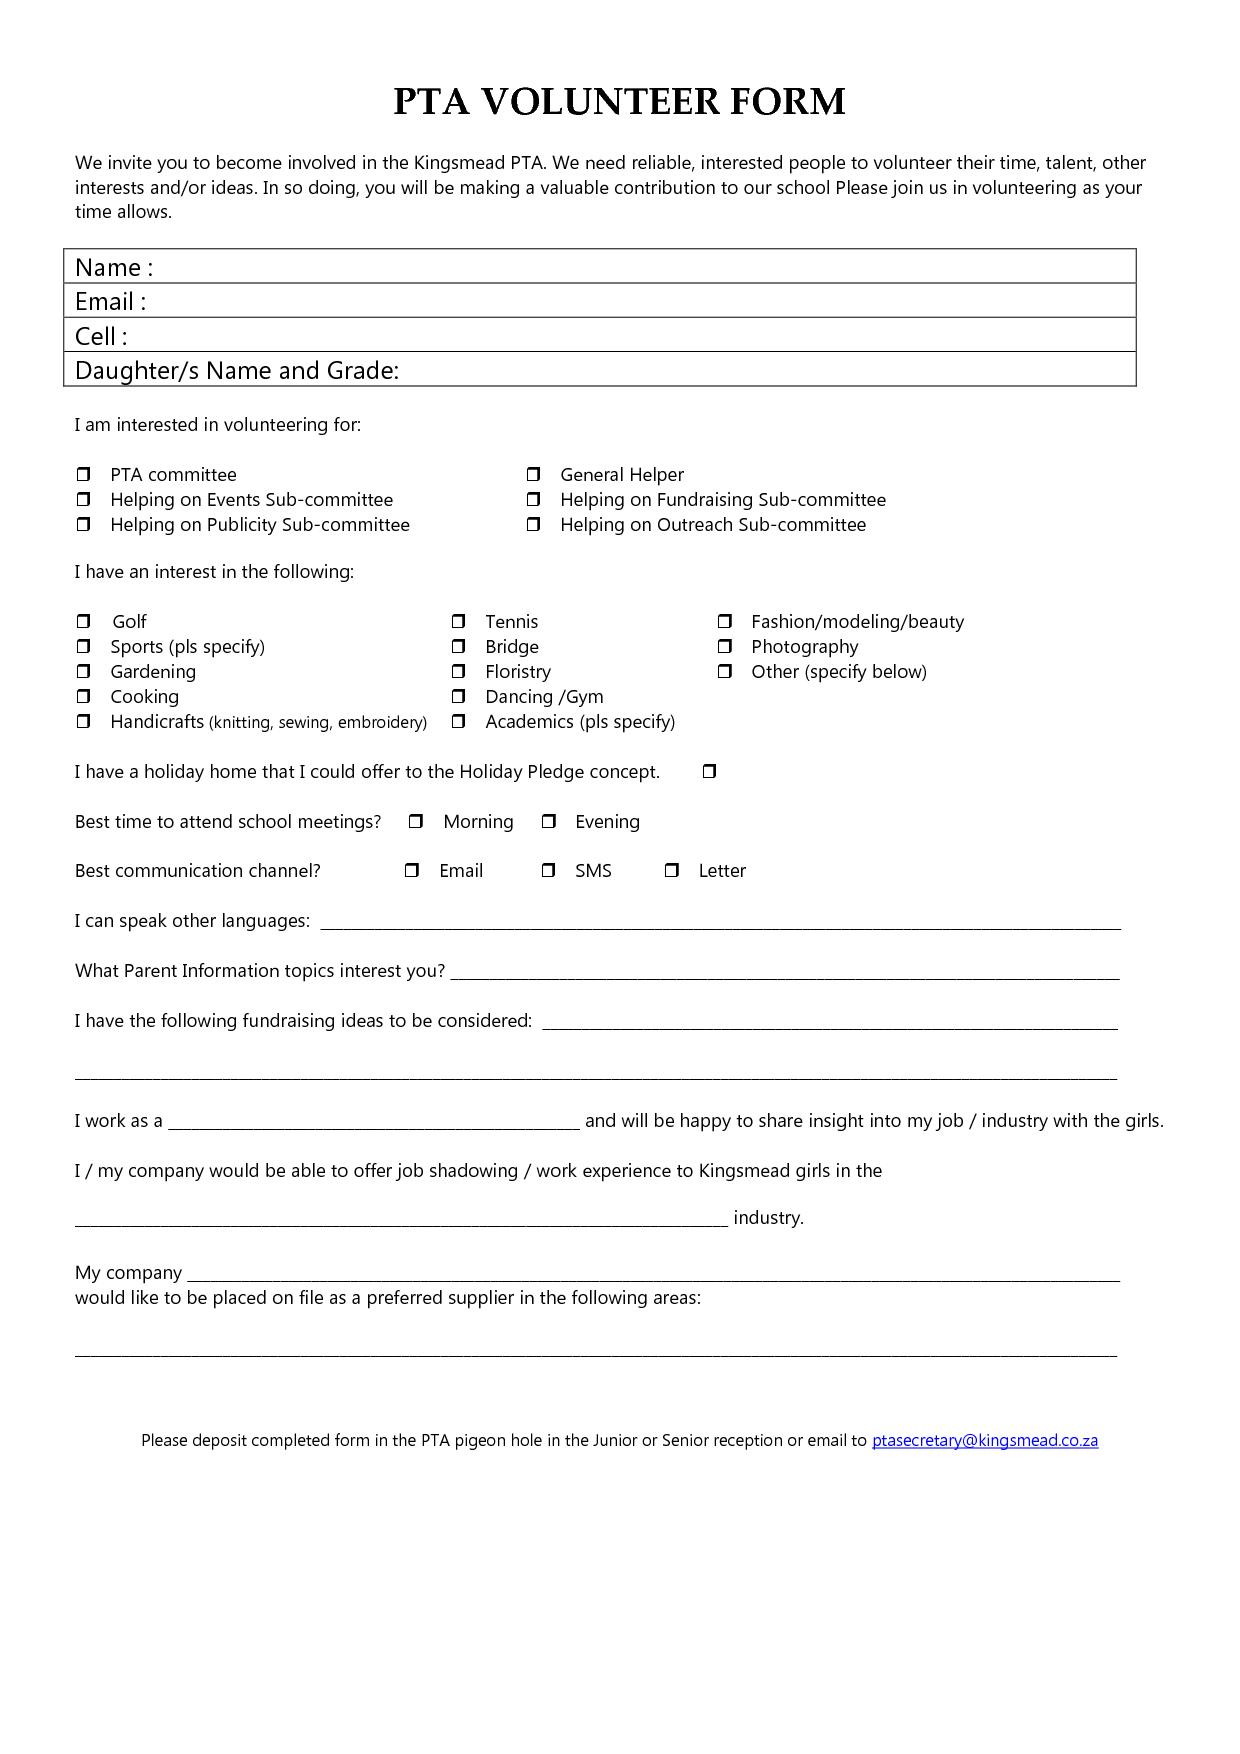 32f99e379a2c628016525c74f1c921ac Volunteer Recruitment Letter Template on volunteer appreciation letter templates, volunteer recruitment invitations, volunteer recruitment posters, volunteer community service letter sample, volunteer recruitment flyers, volunteer recruitment banners, volunteer recruitment email, volunteer recruitment brochures,